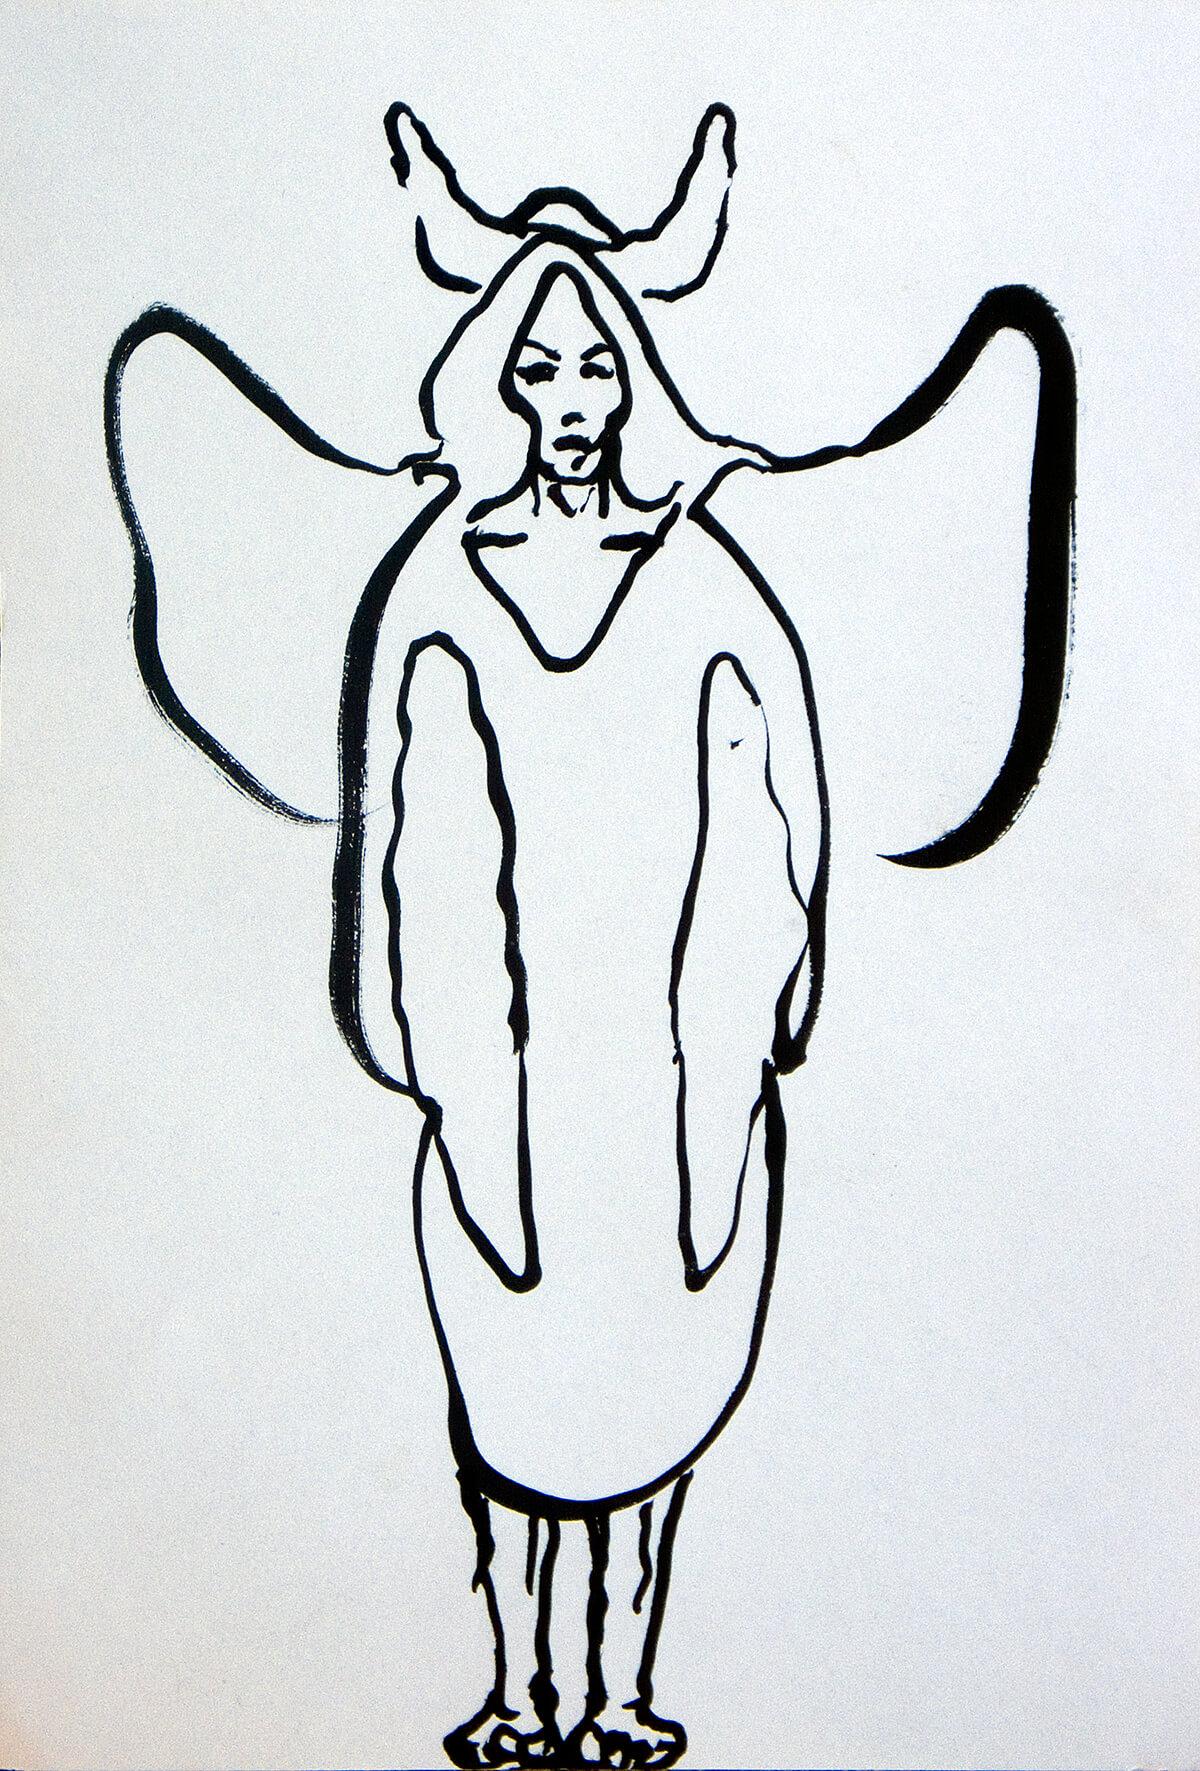 untitled (Viking angel), 15 x 10 cm, ink on paper, 2014